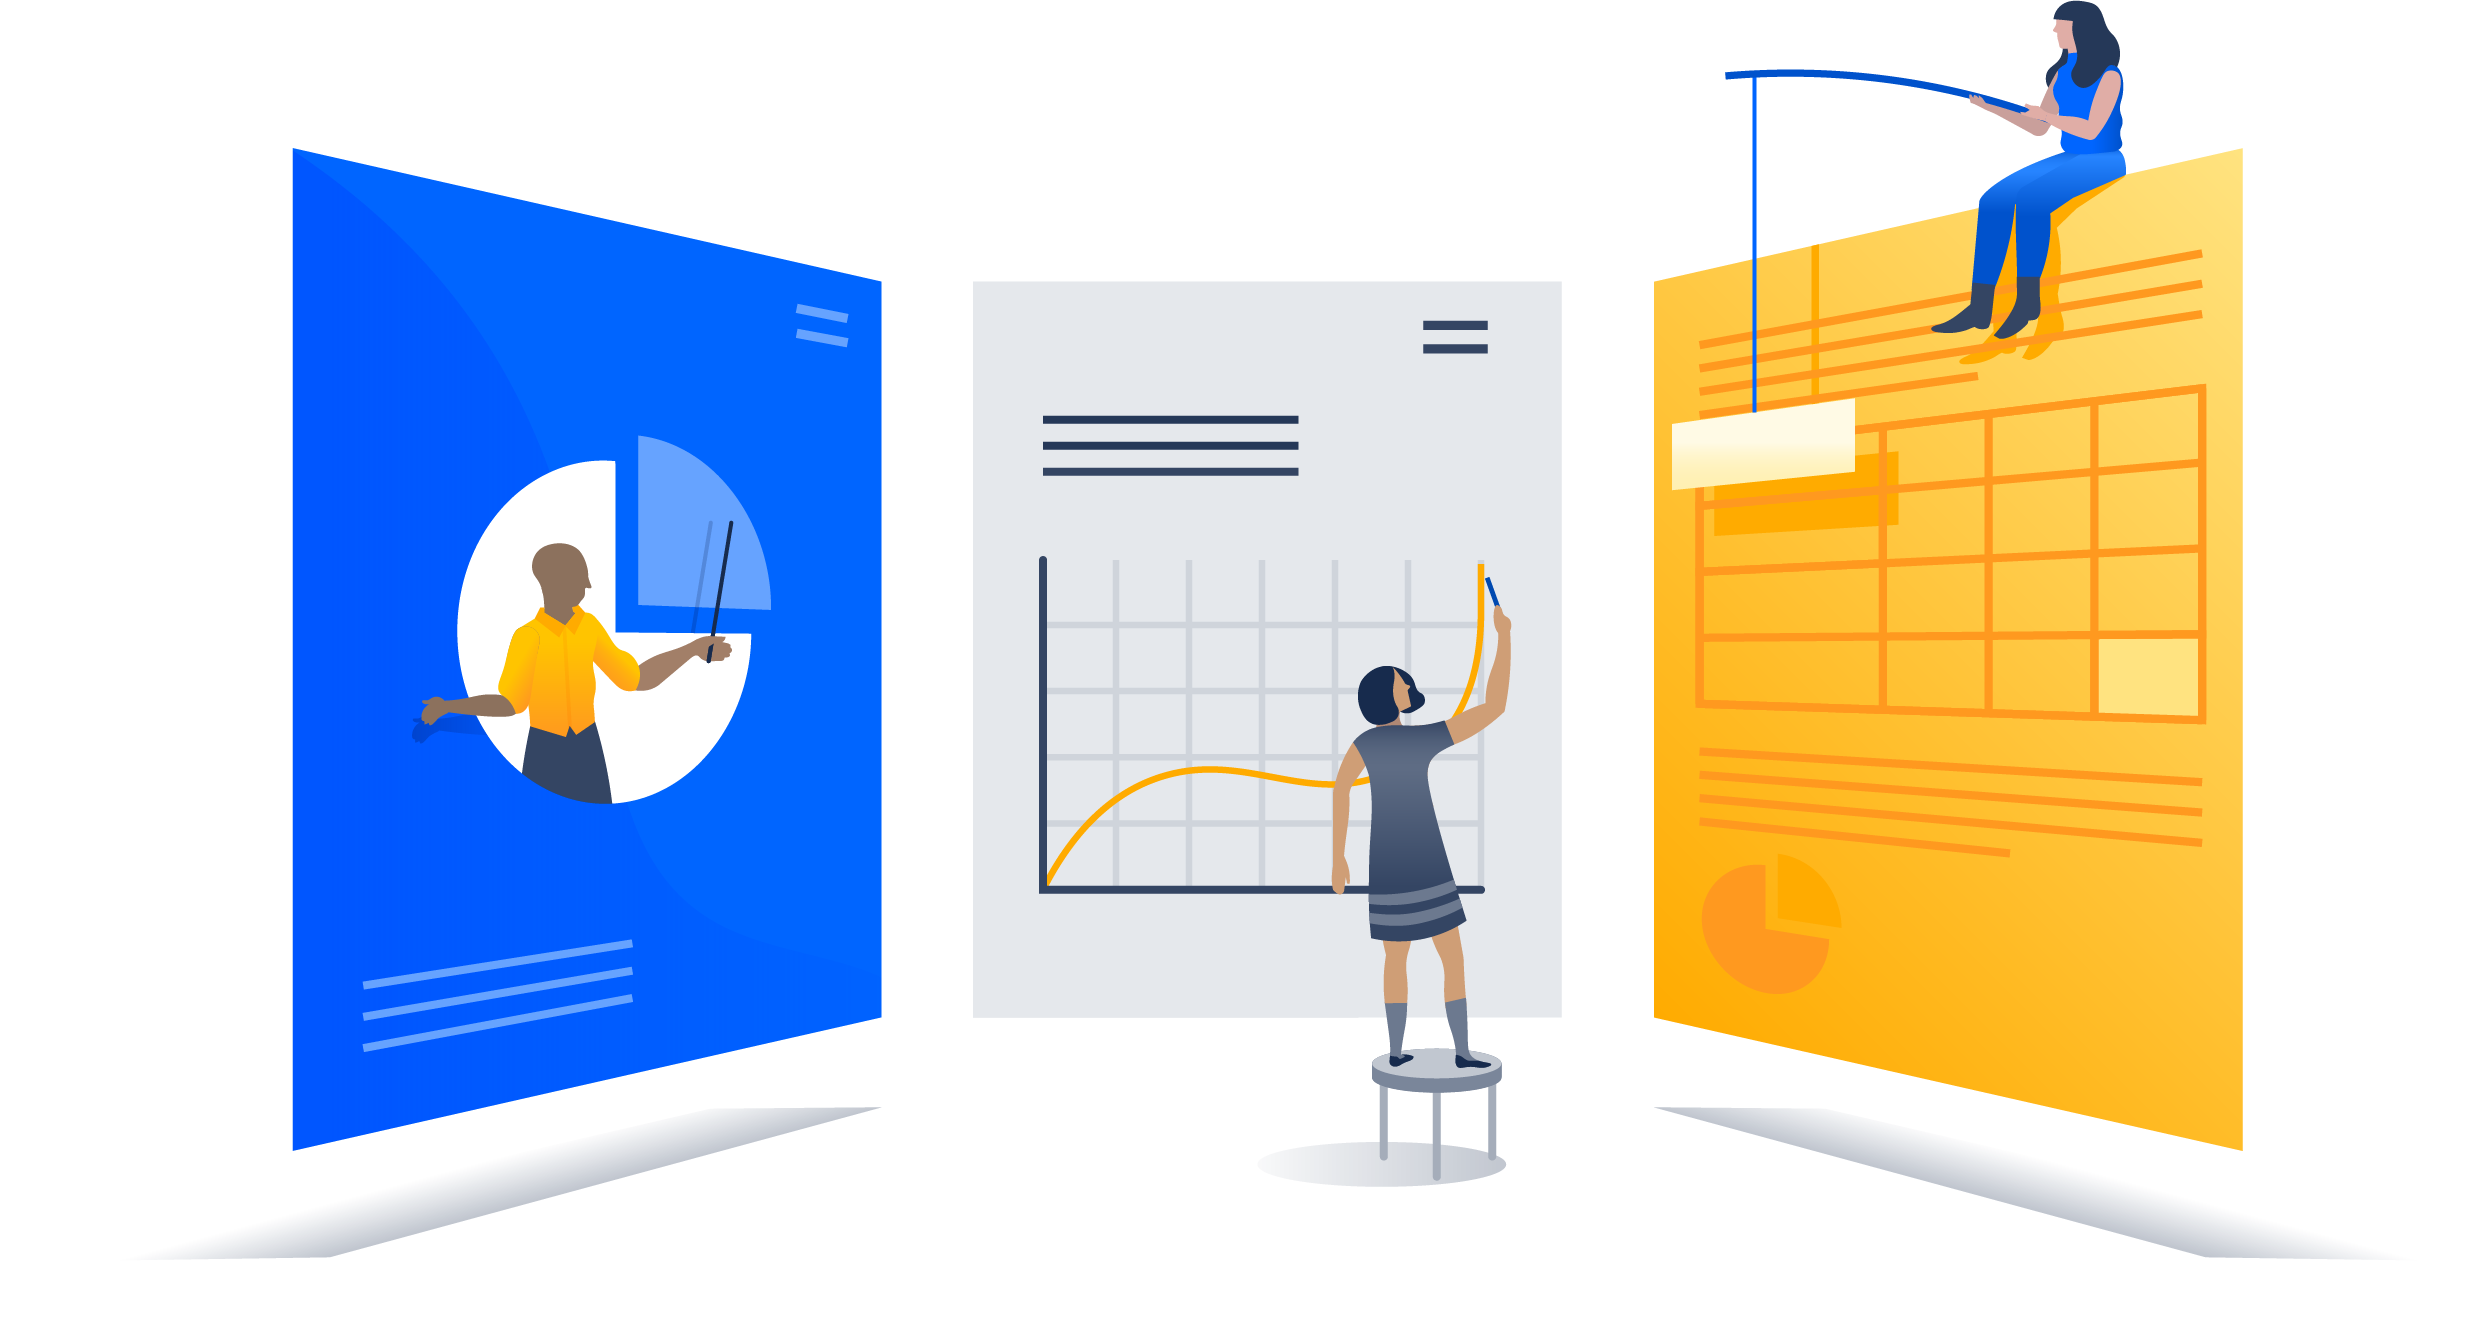 Desarrollador ágil | Orientador ágil de Atlassian